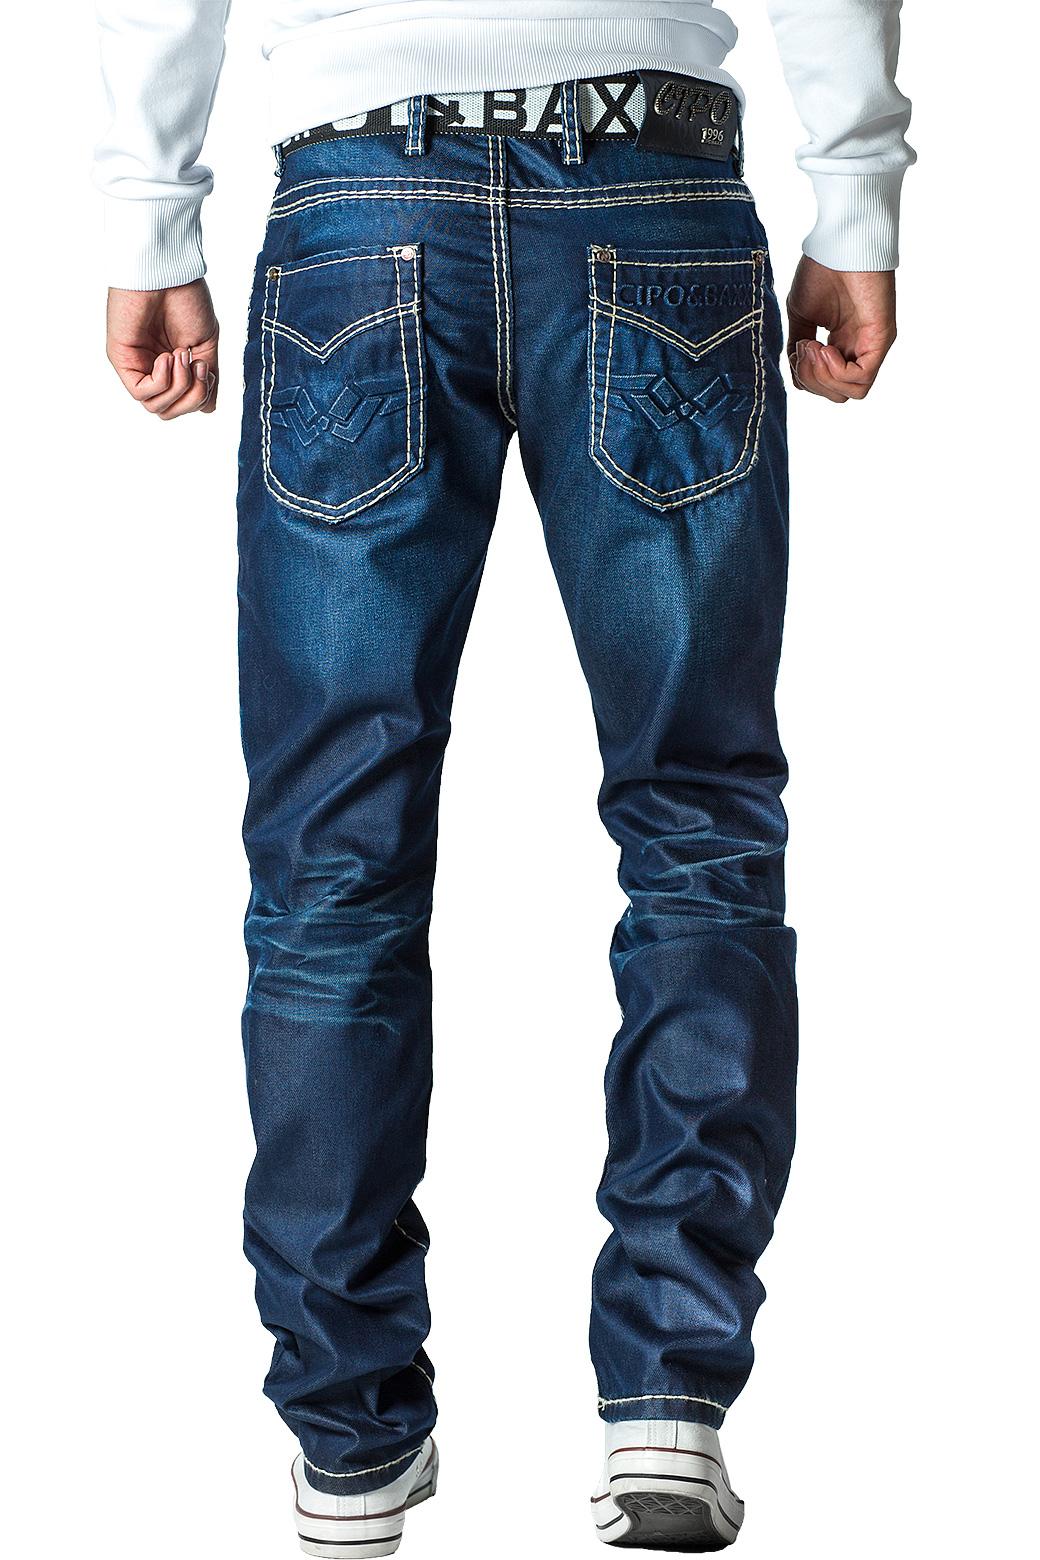 Cipo-amp-Baxx-Uomo-Jeans-Pantaloni-ricamate-Biker-Style-streetwear-nervature-pattern-Dope miniatura 15